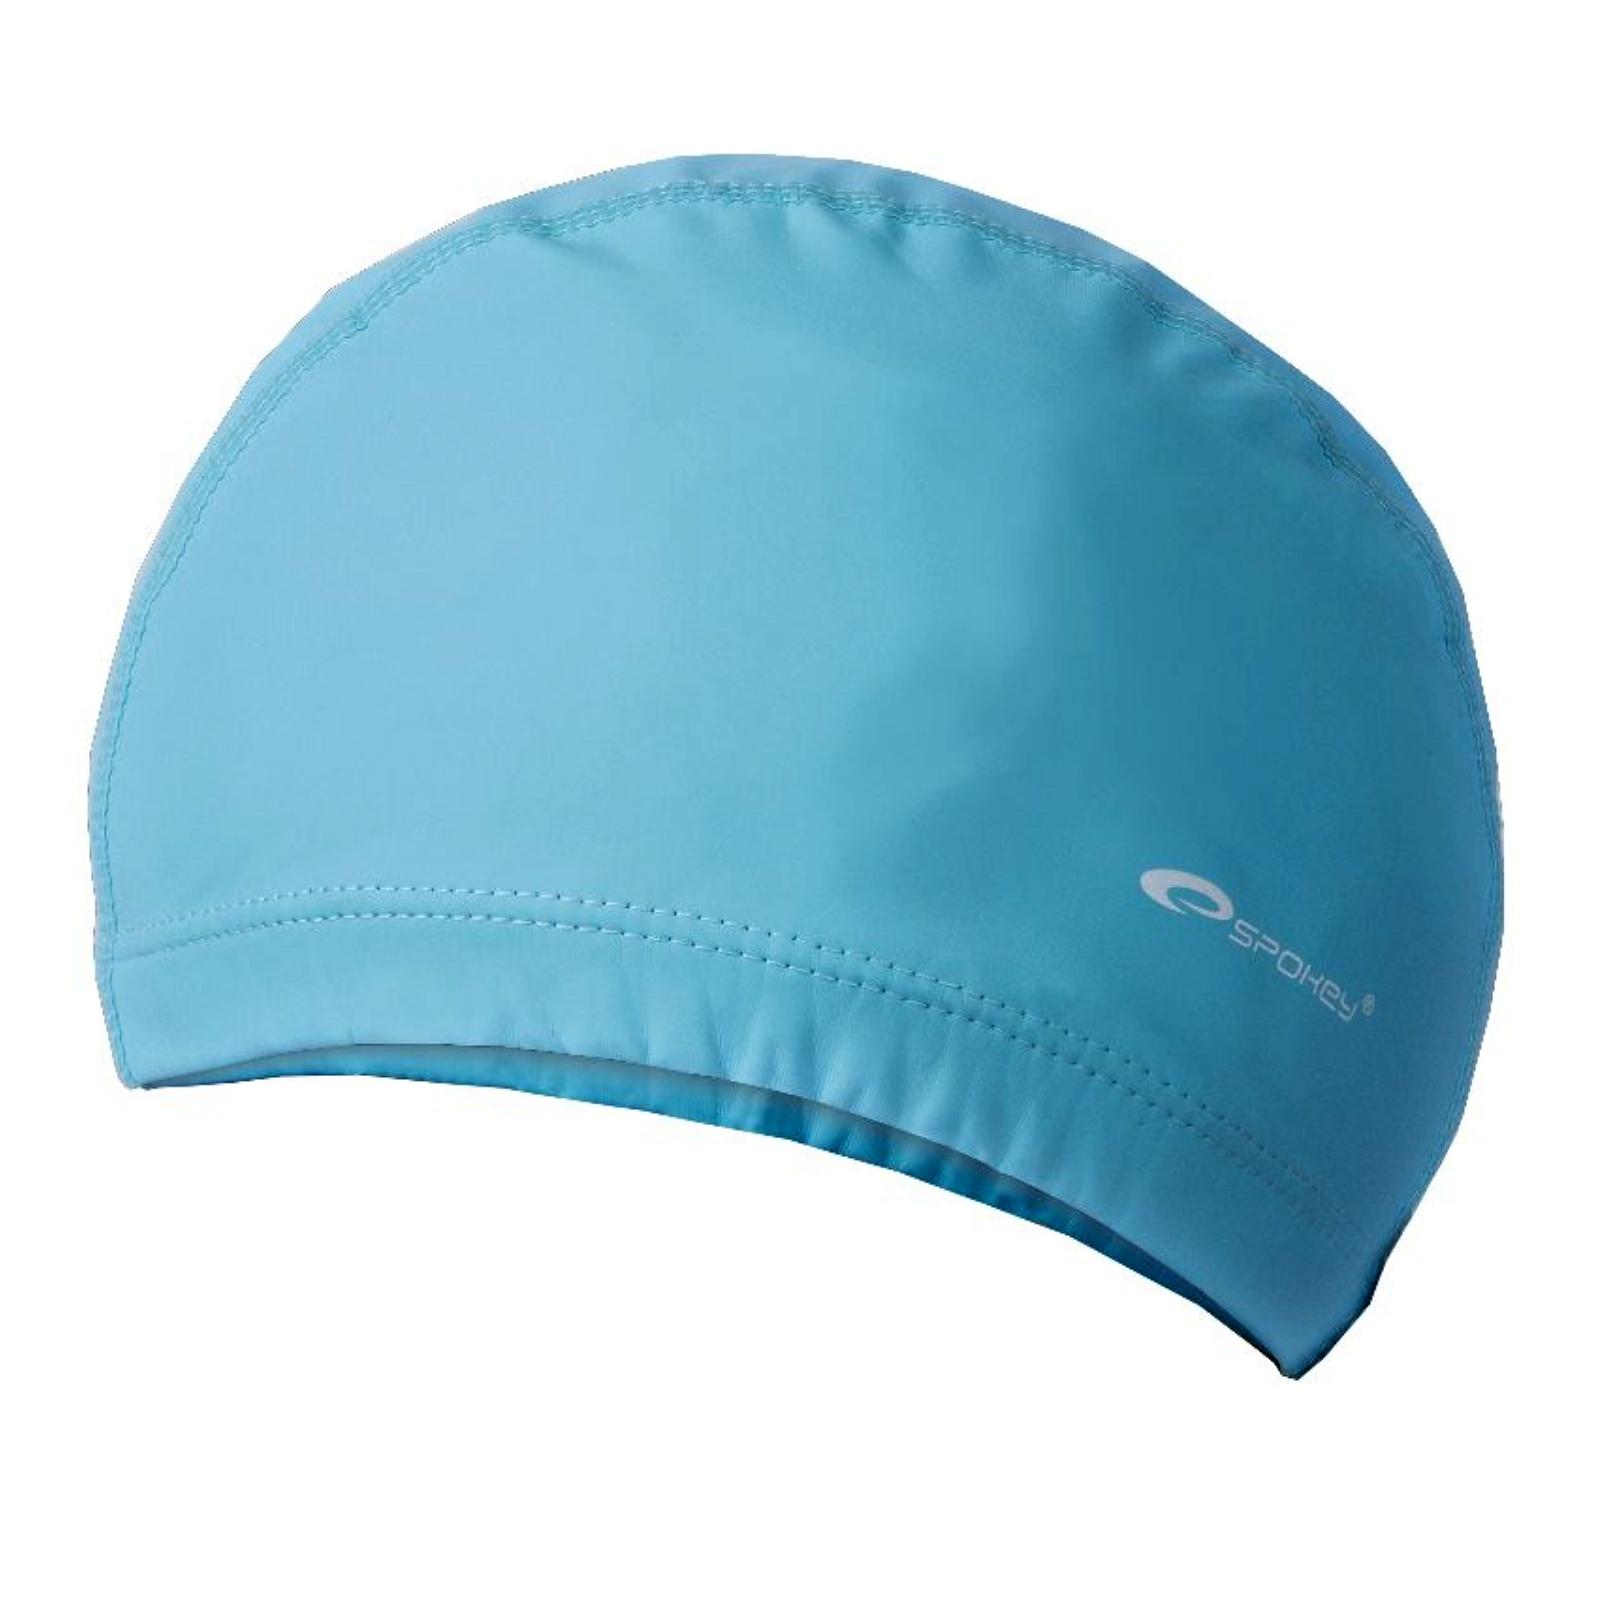 Plavecká čepice SPOKEY Torpedo - modrá